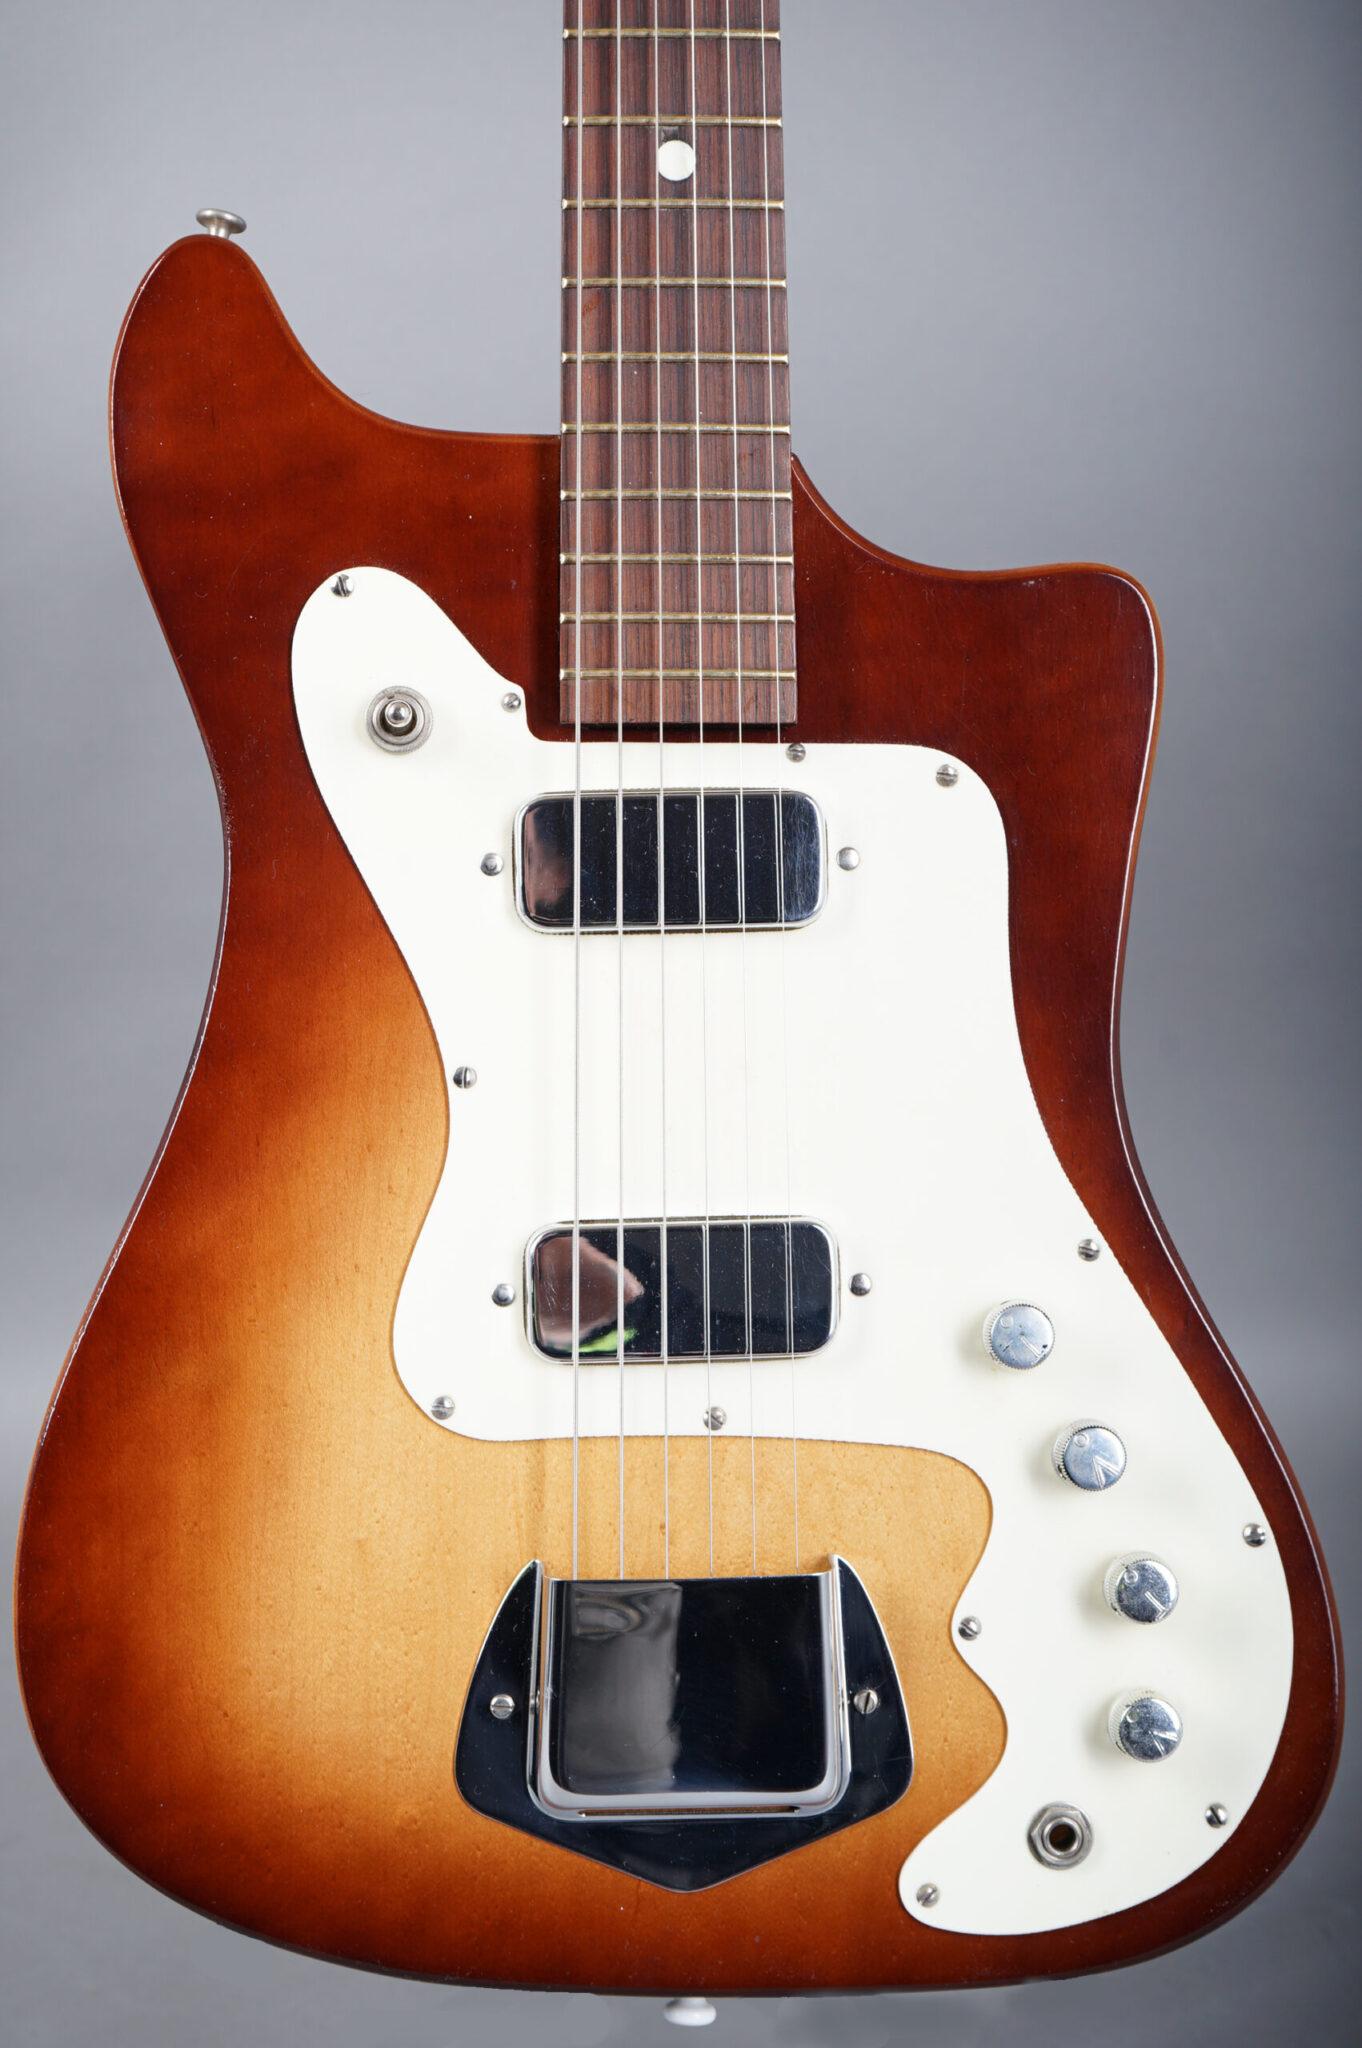 https://guitarpoint.de/app/uploads/products/1961-kay-vanguard-k102-sunburst-near-mint/1961-Kay-Vanguard-2-scaled-1362x2048.jpg